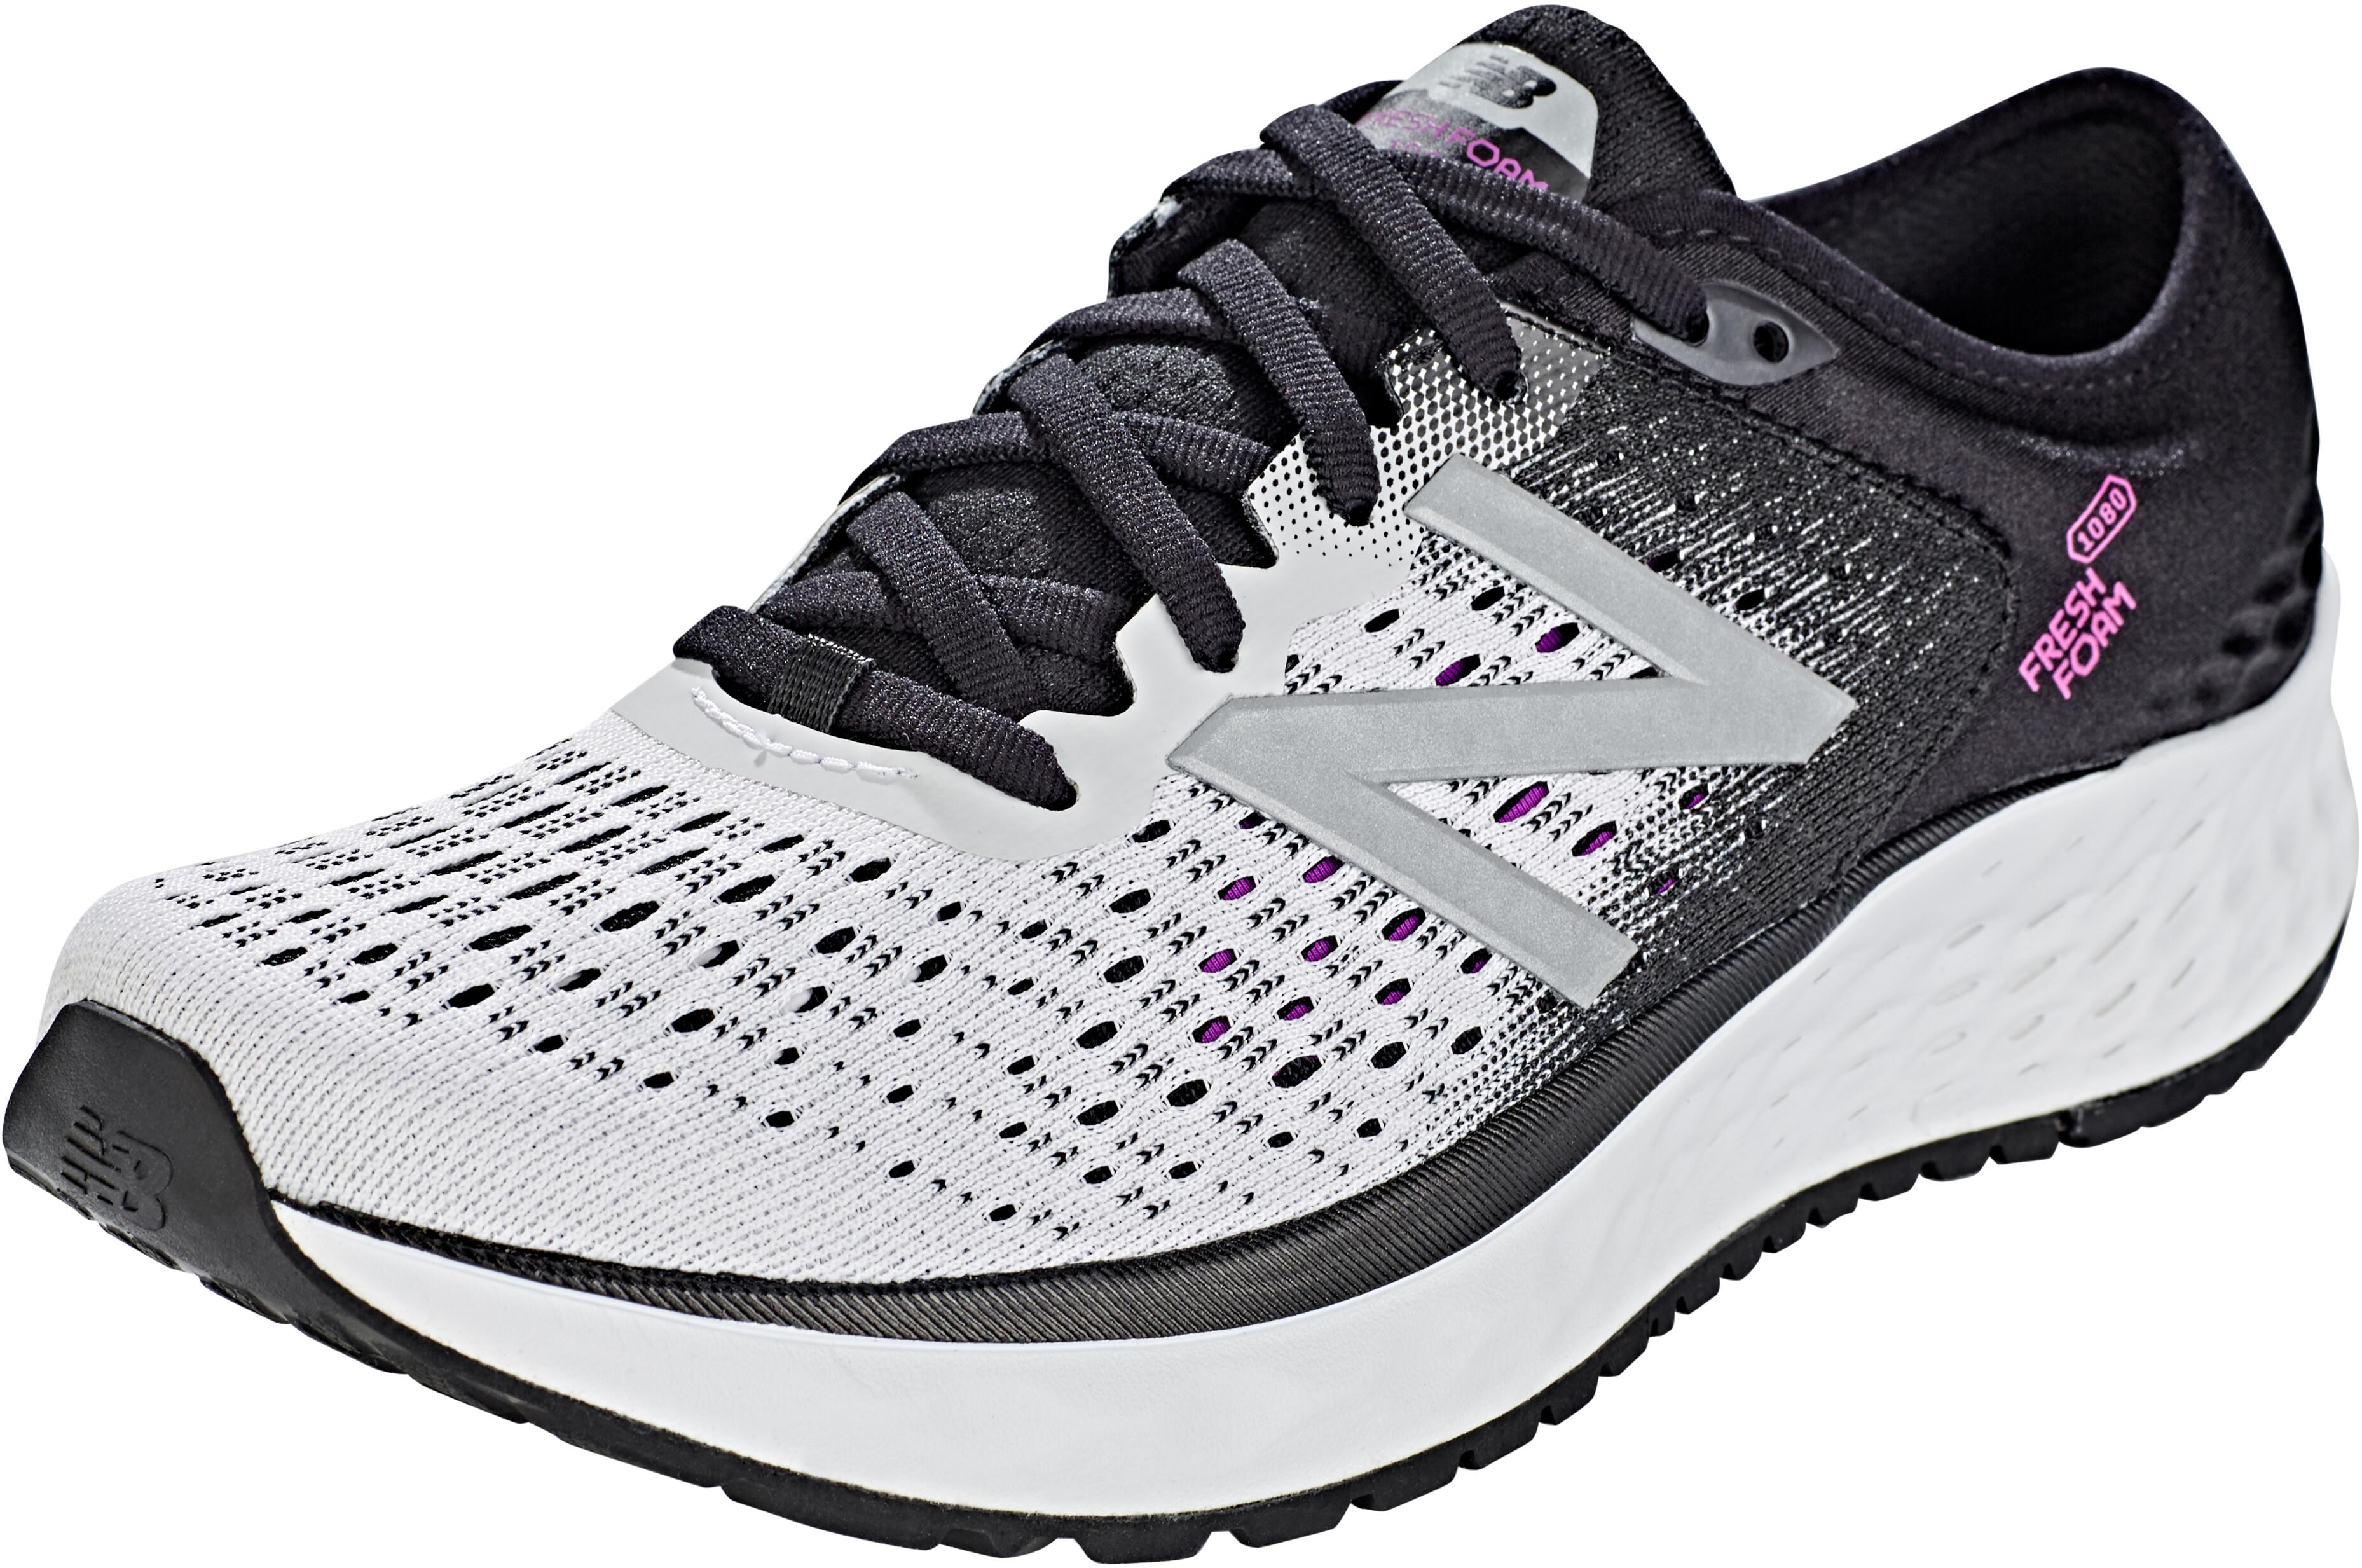 usine authentique 83982 10ca8 New Balance 1080 V9 Chaussures Femme, white/black